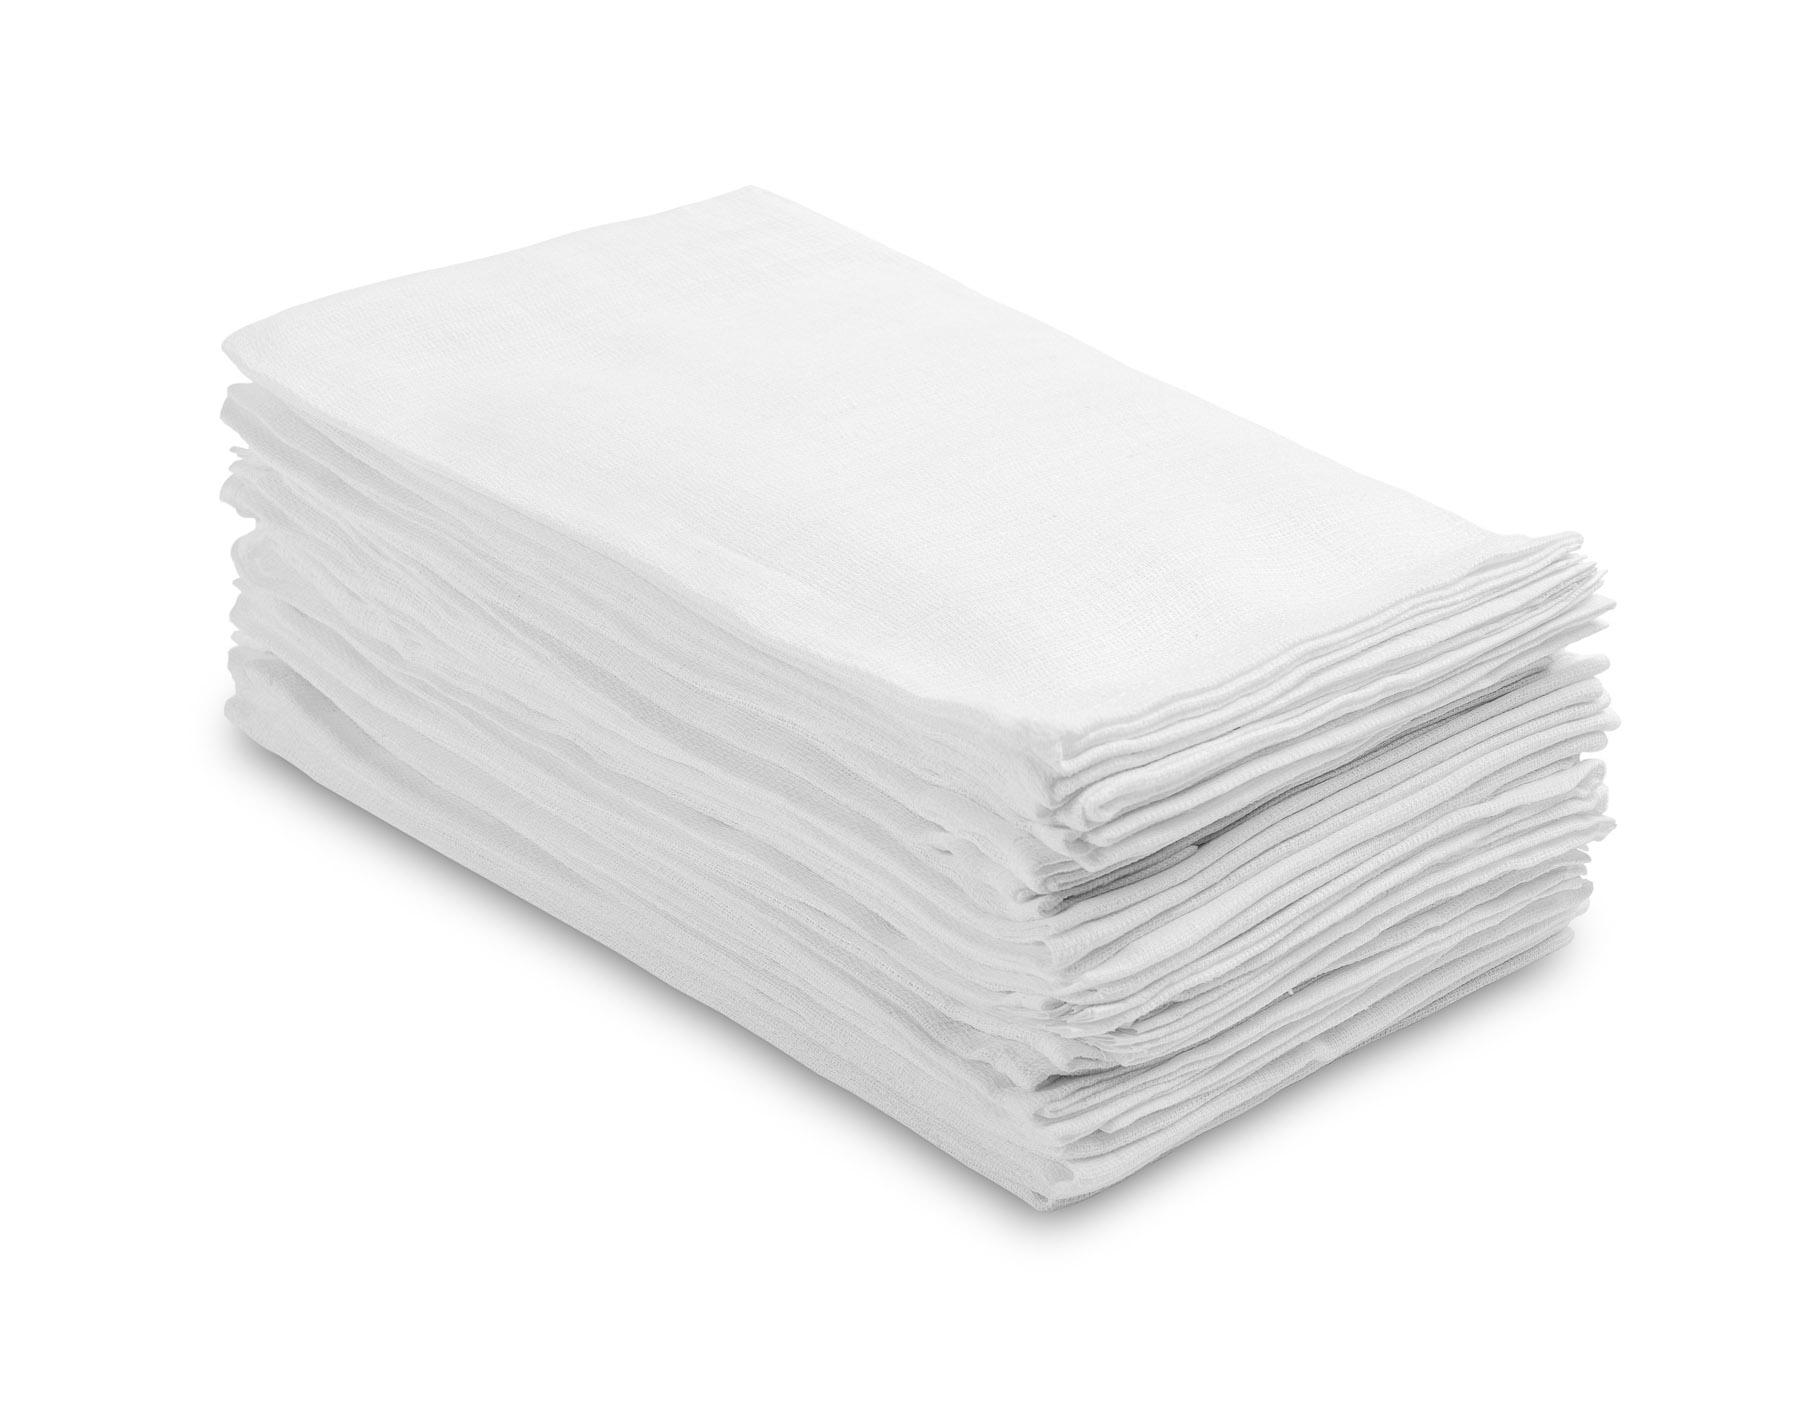 Standard – tetra diapers